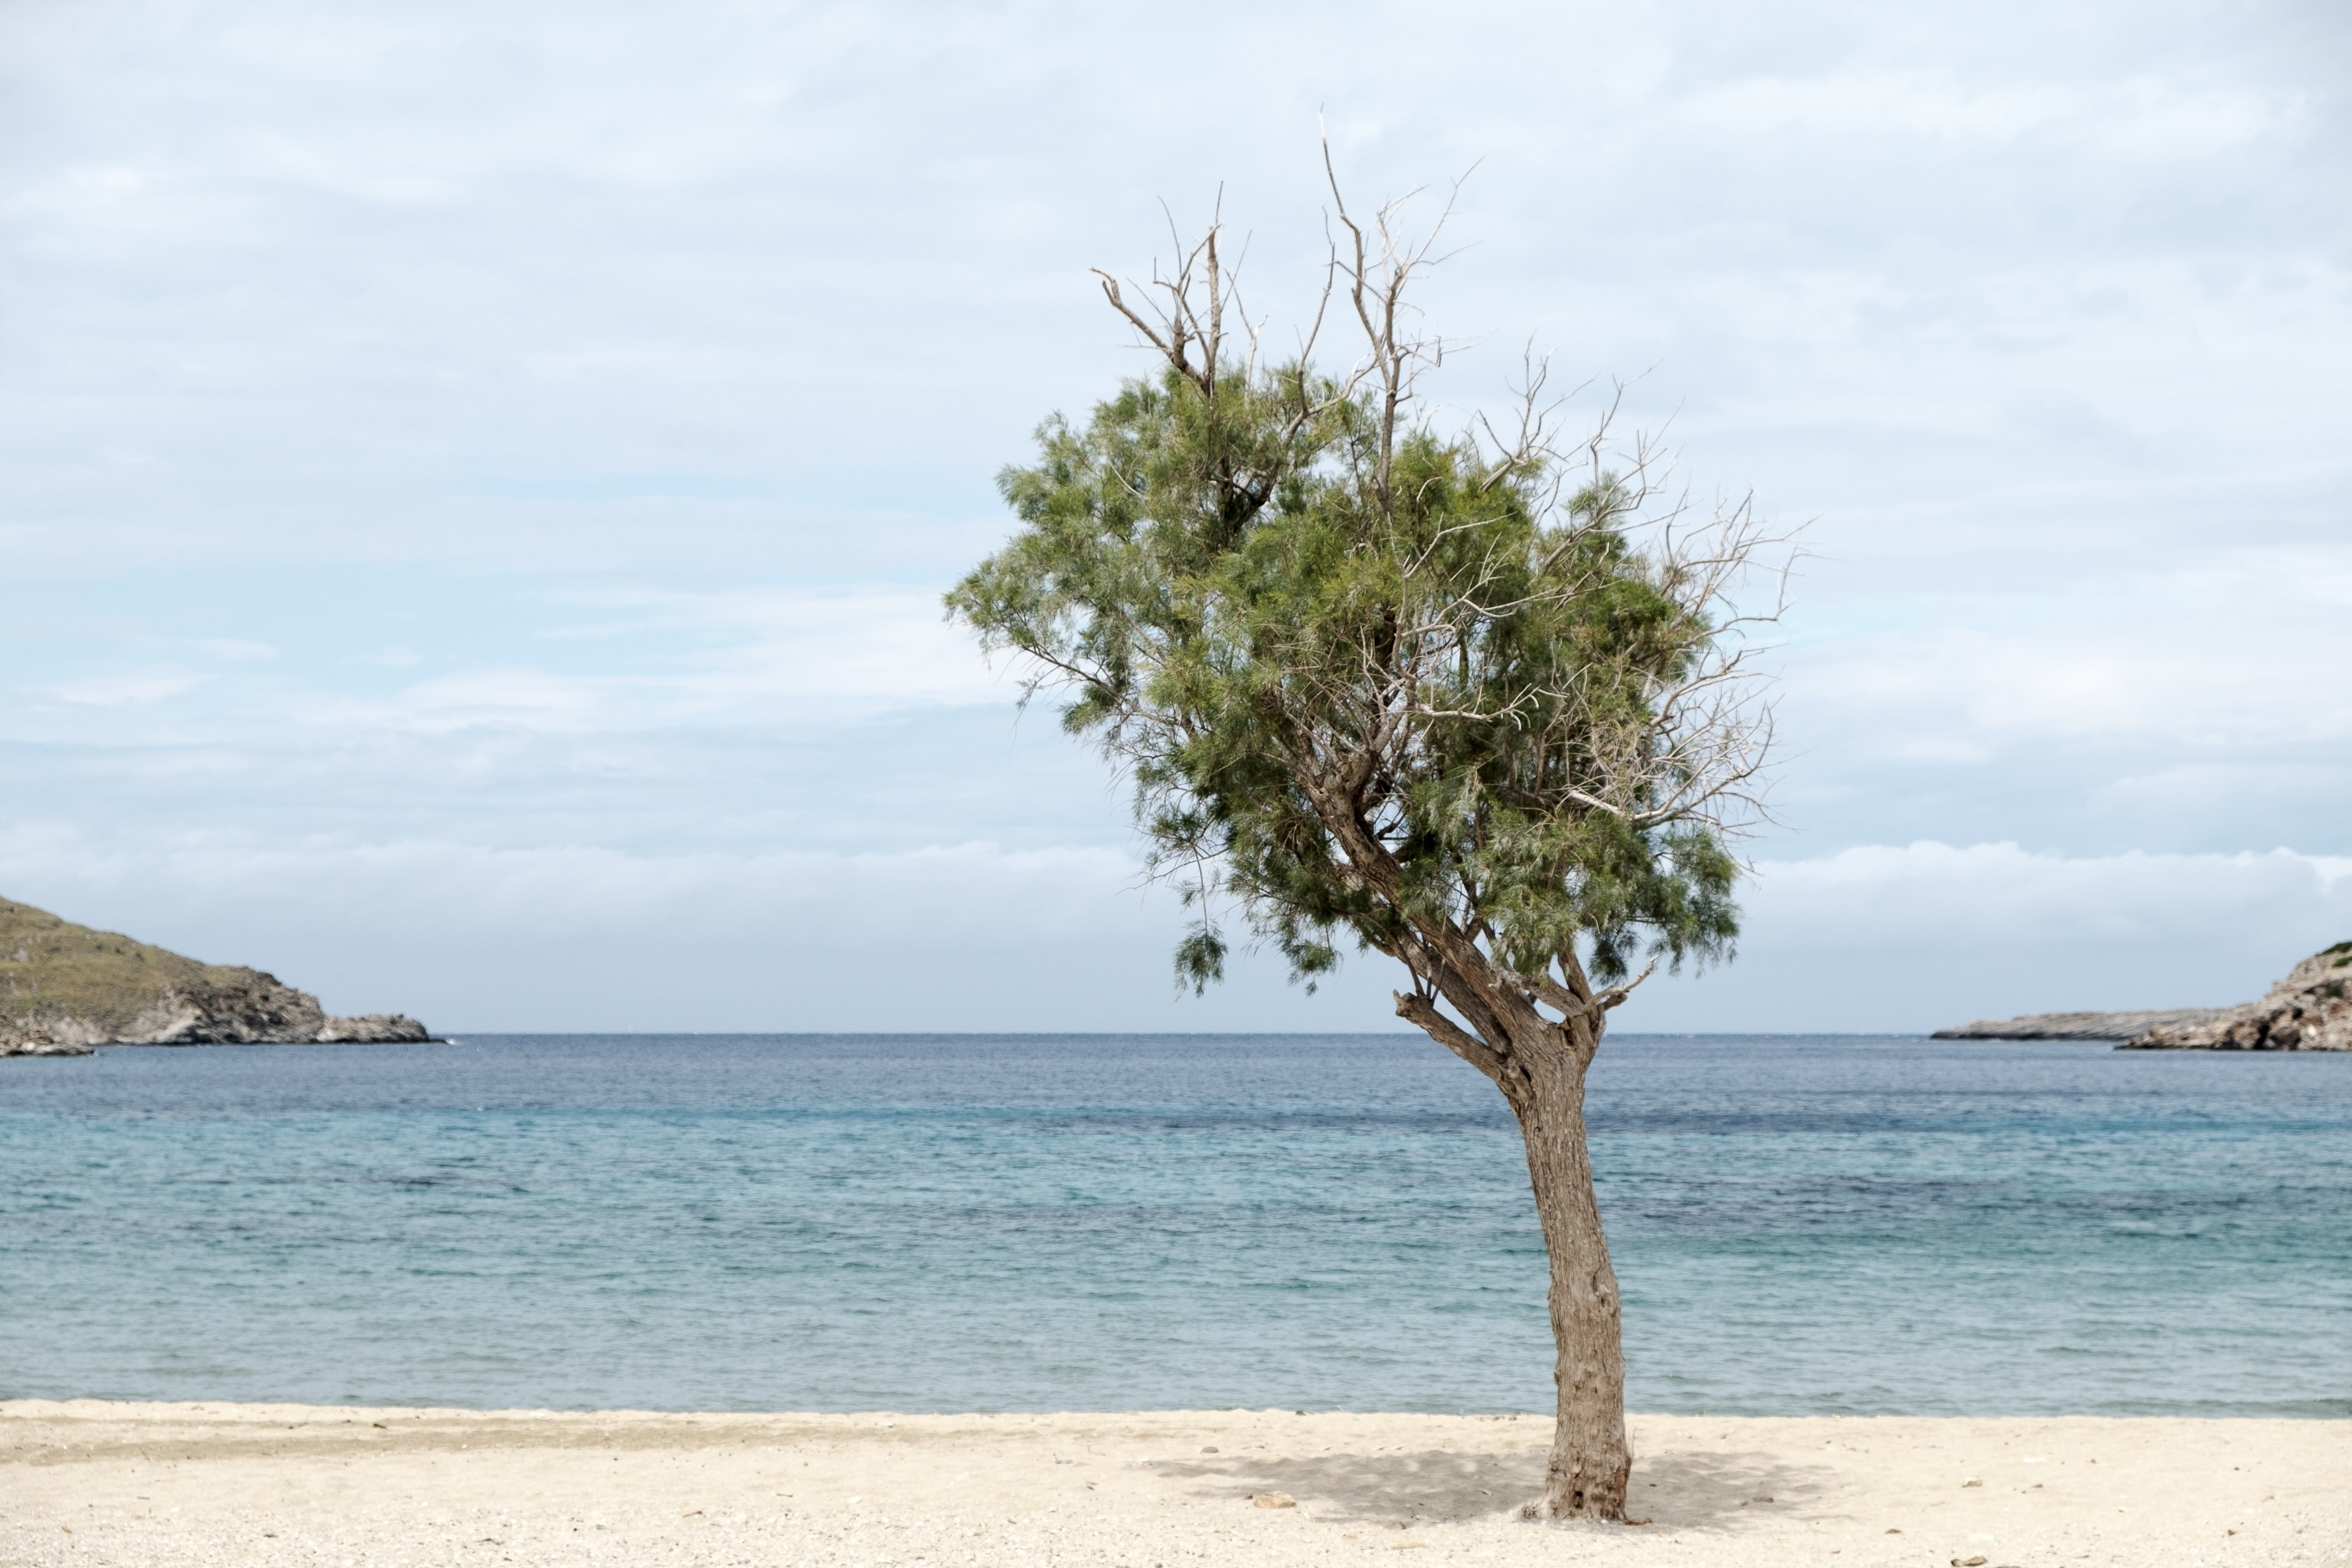 brown tree on seashore during daytime